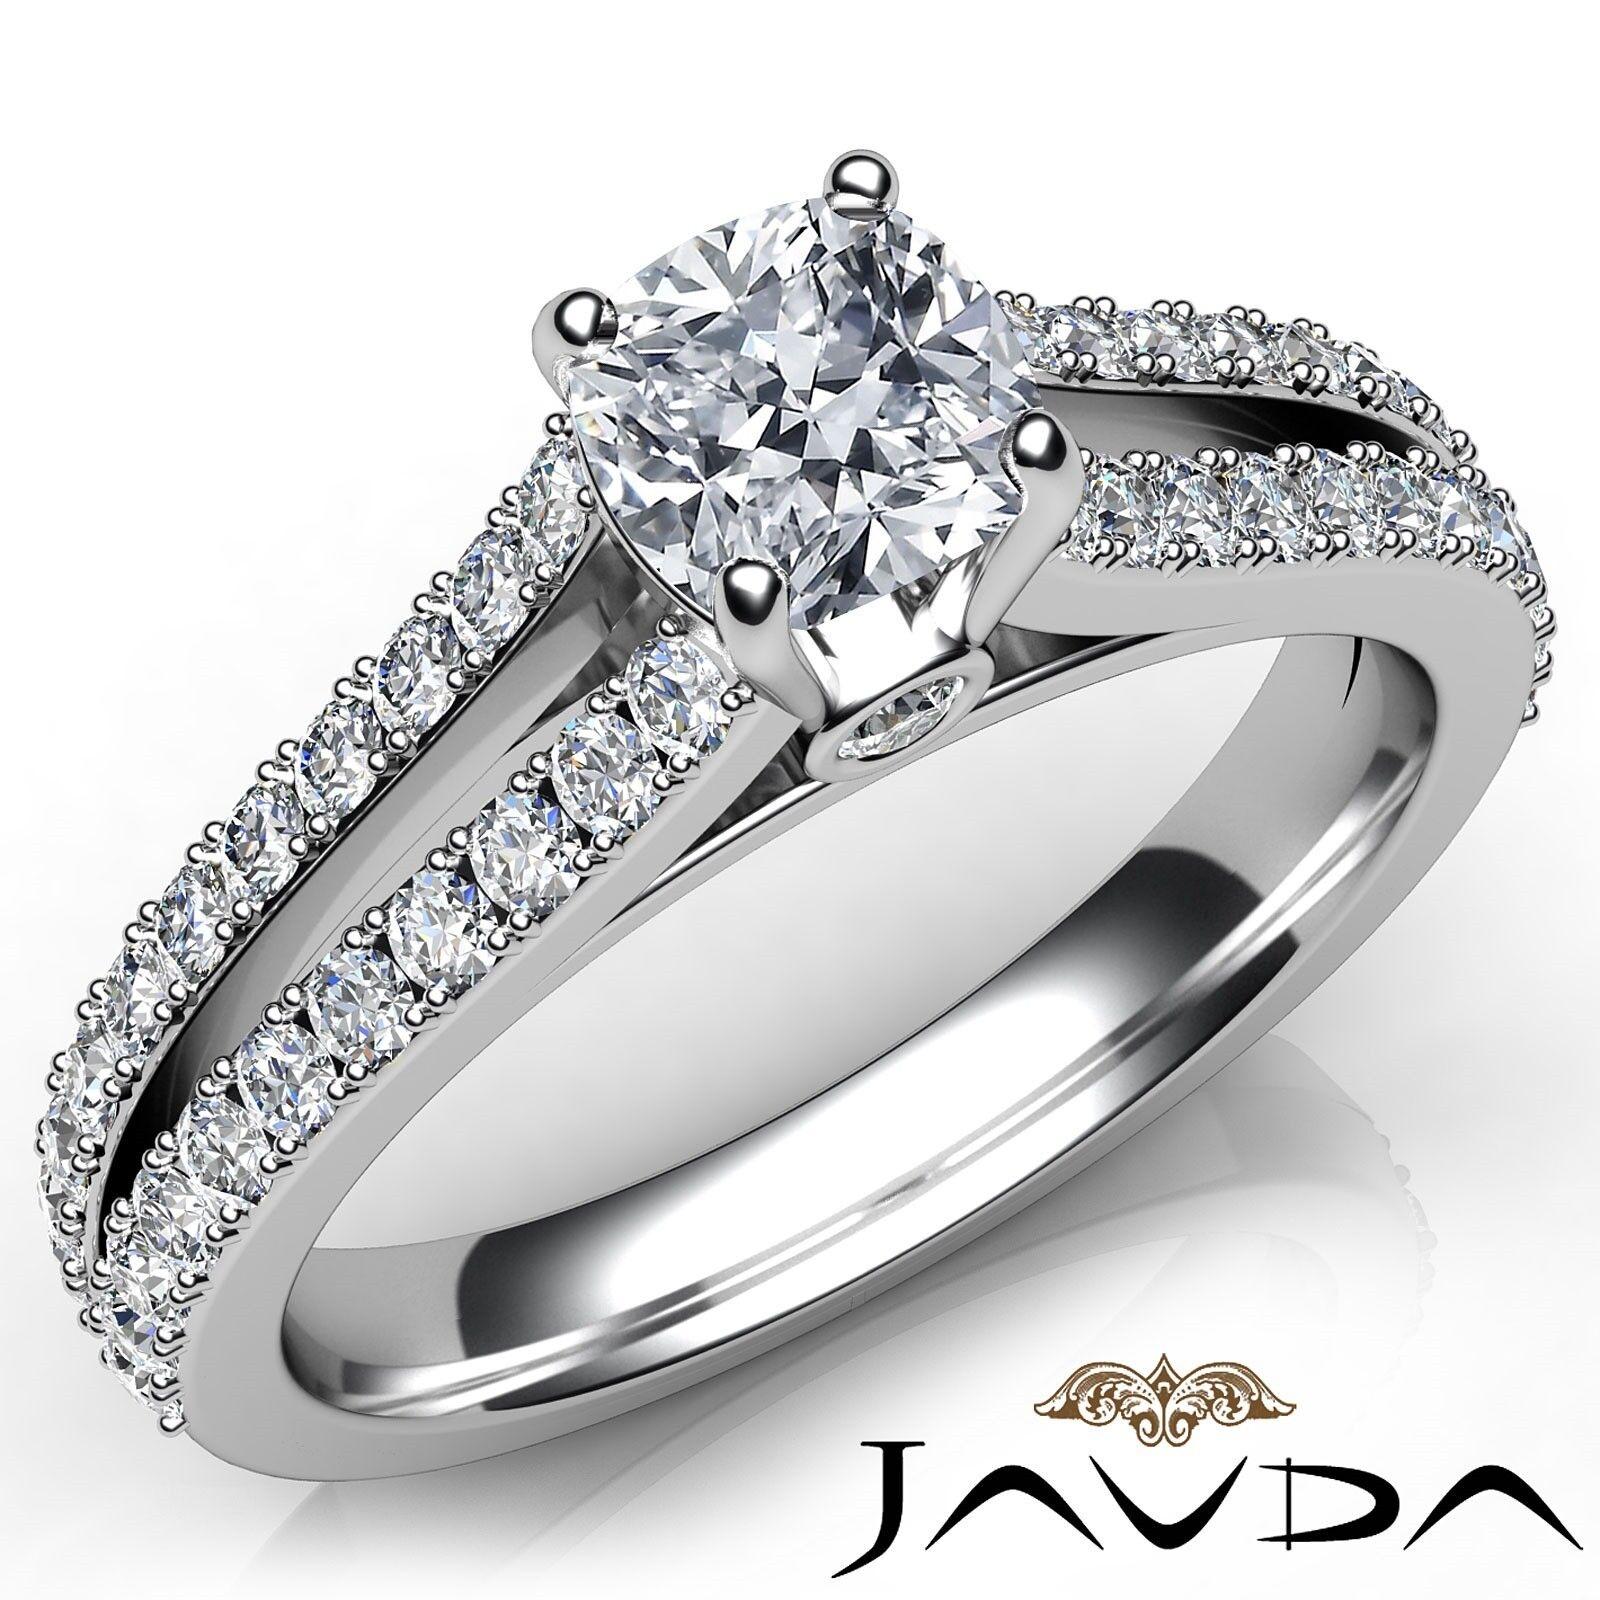 1.66ctw Double Prong Split Shank Cushion Diamond Engagement Ring GIA H-VS2  Gold